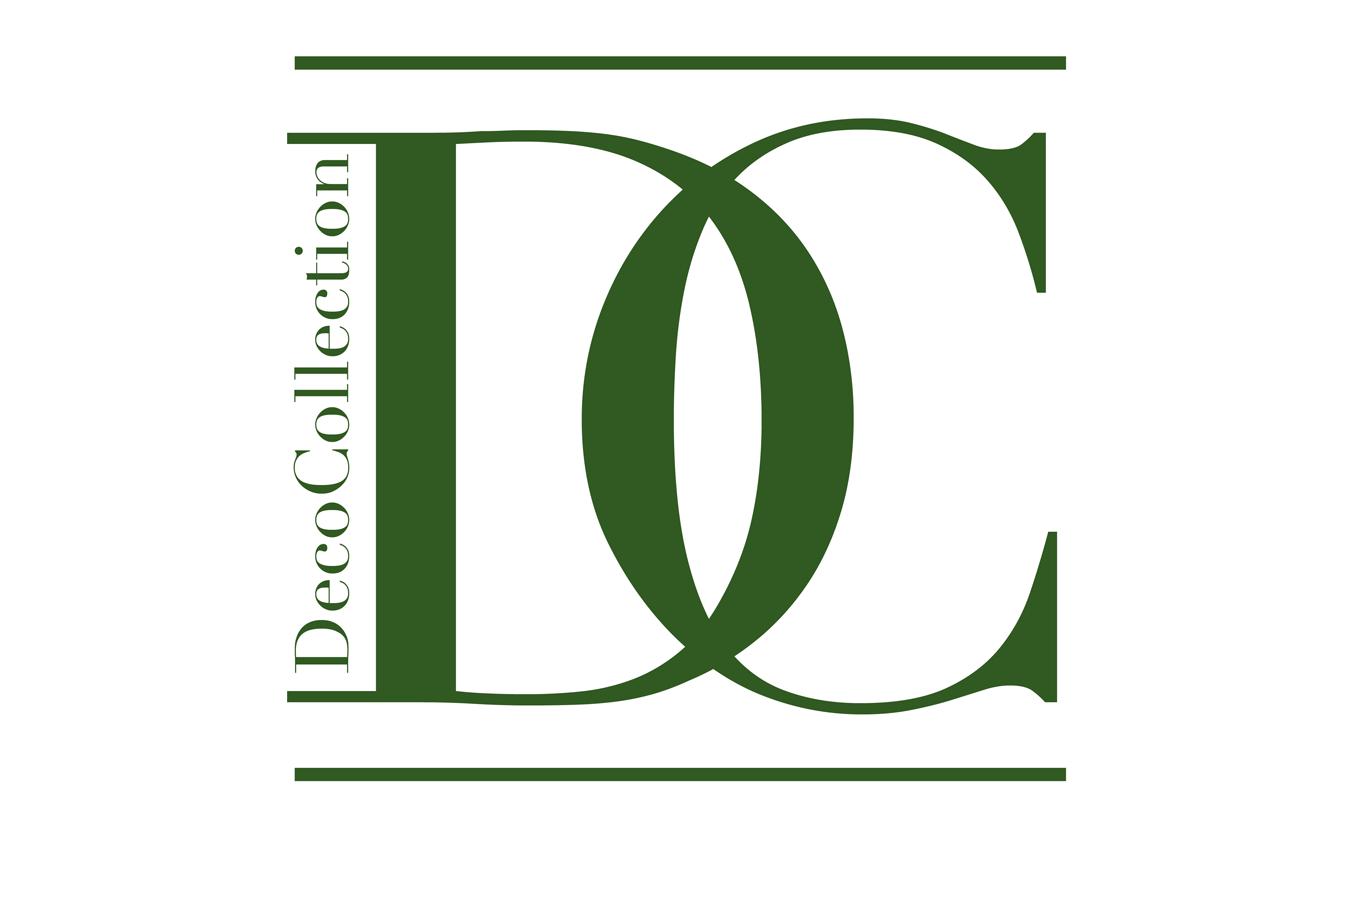 LOGO DC green- 24 36 96